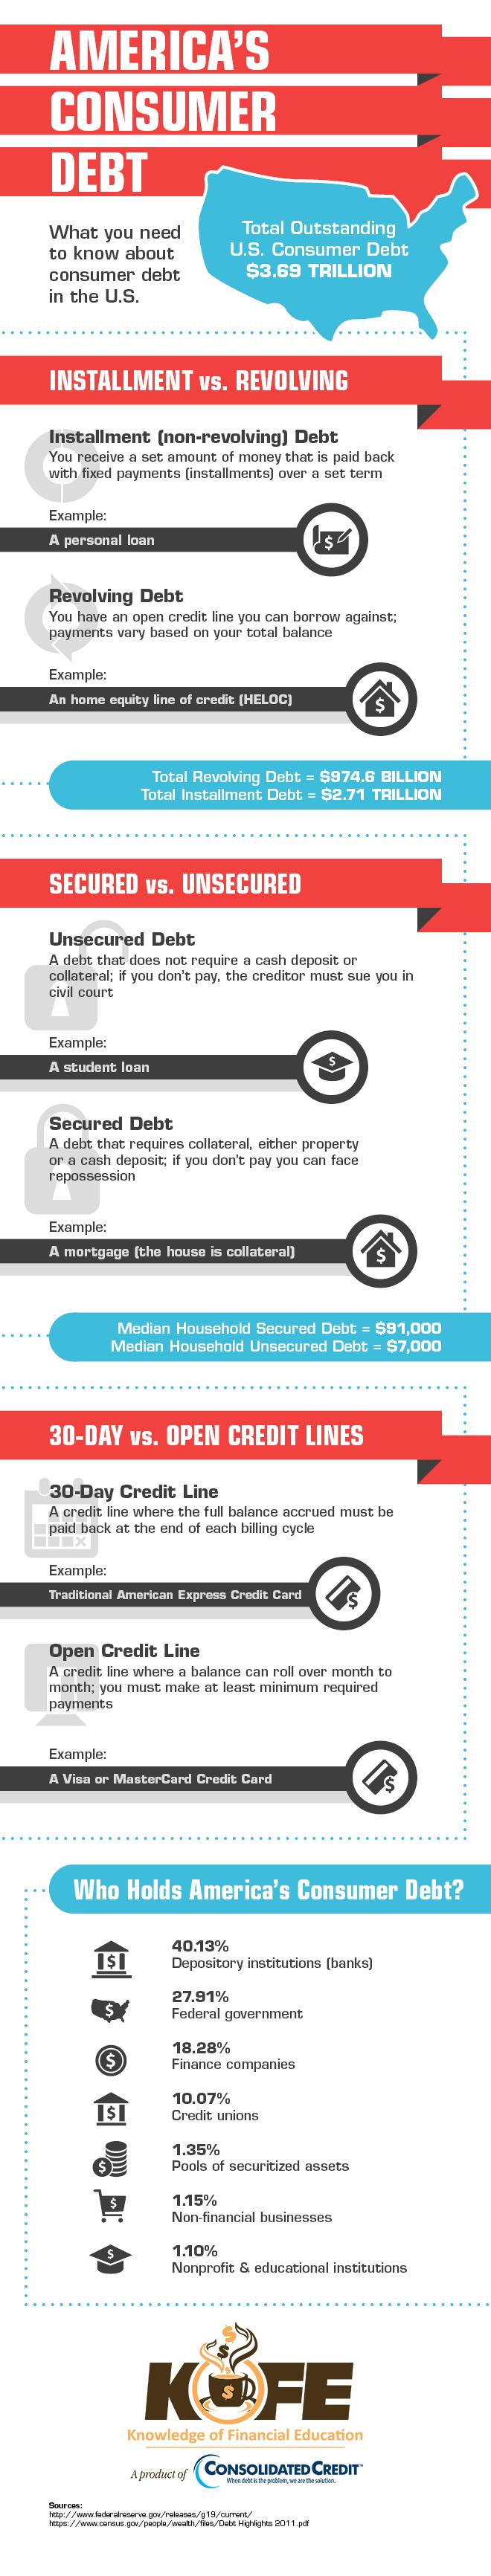 America's Consumer Debt infographic